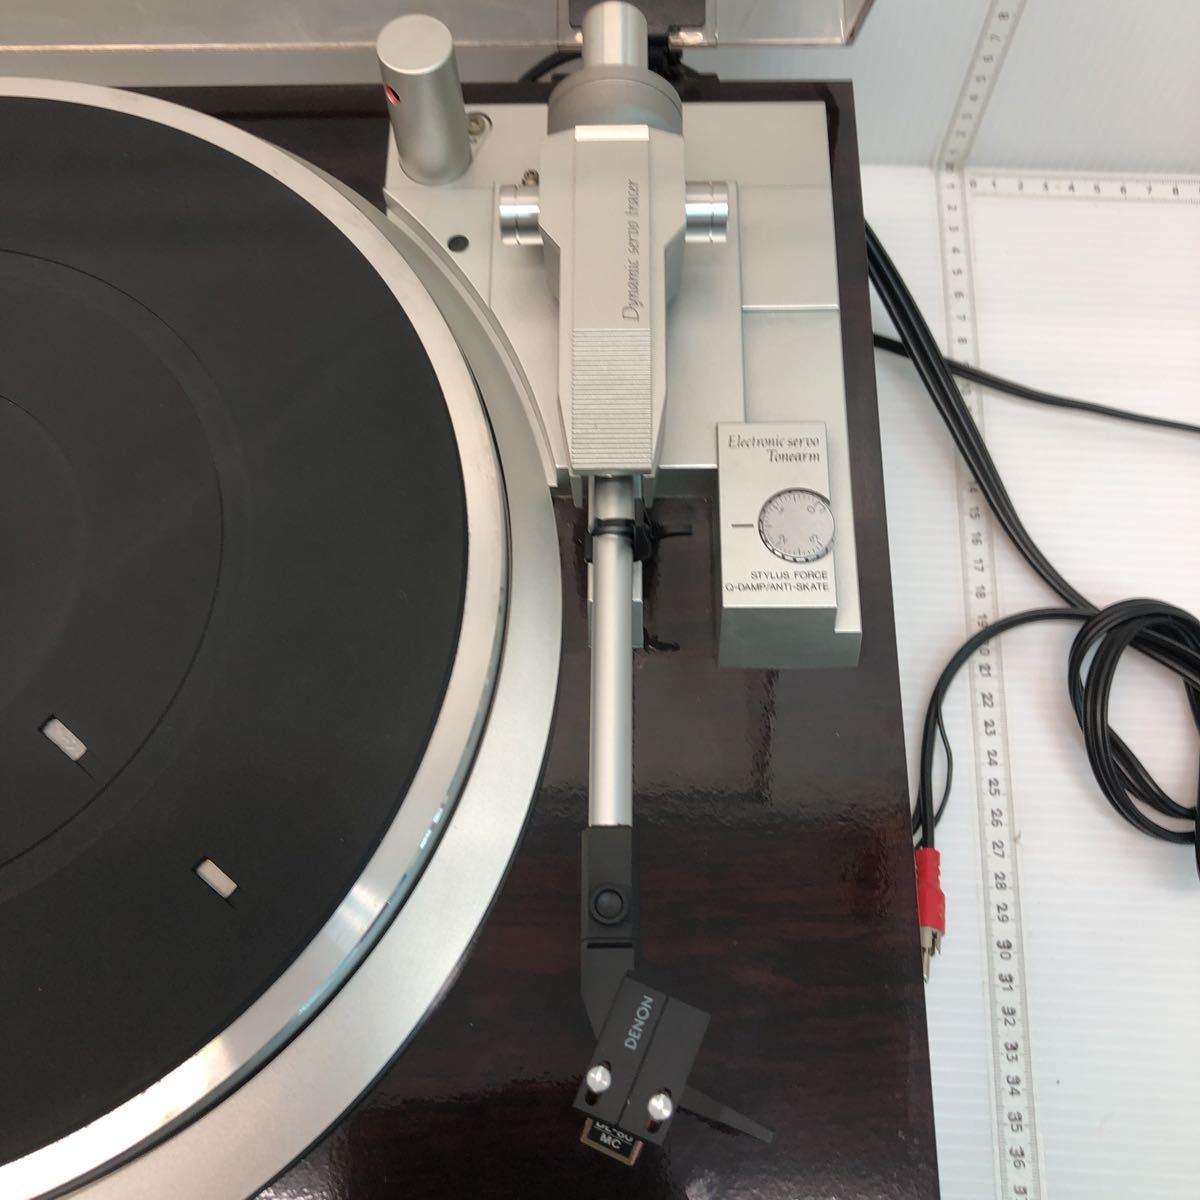 DENON デノン レコードプレーヤー DP-47F 通電のみ確認 ジャンク 1円スタート_画像5